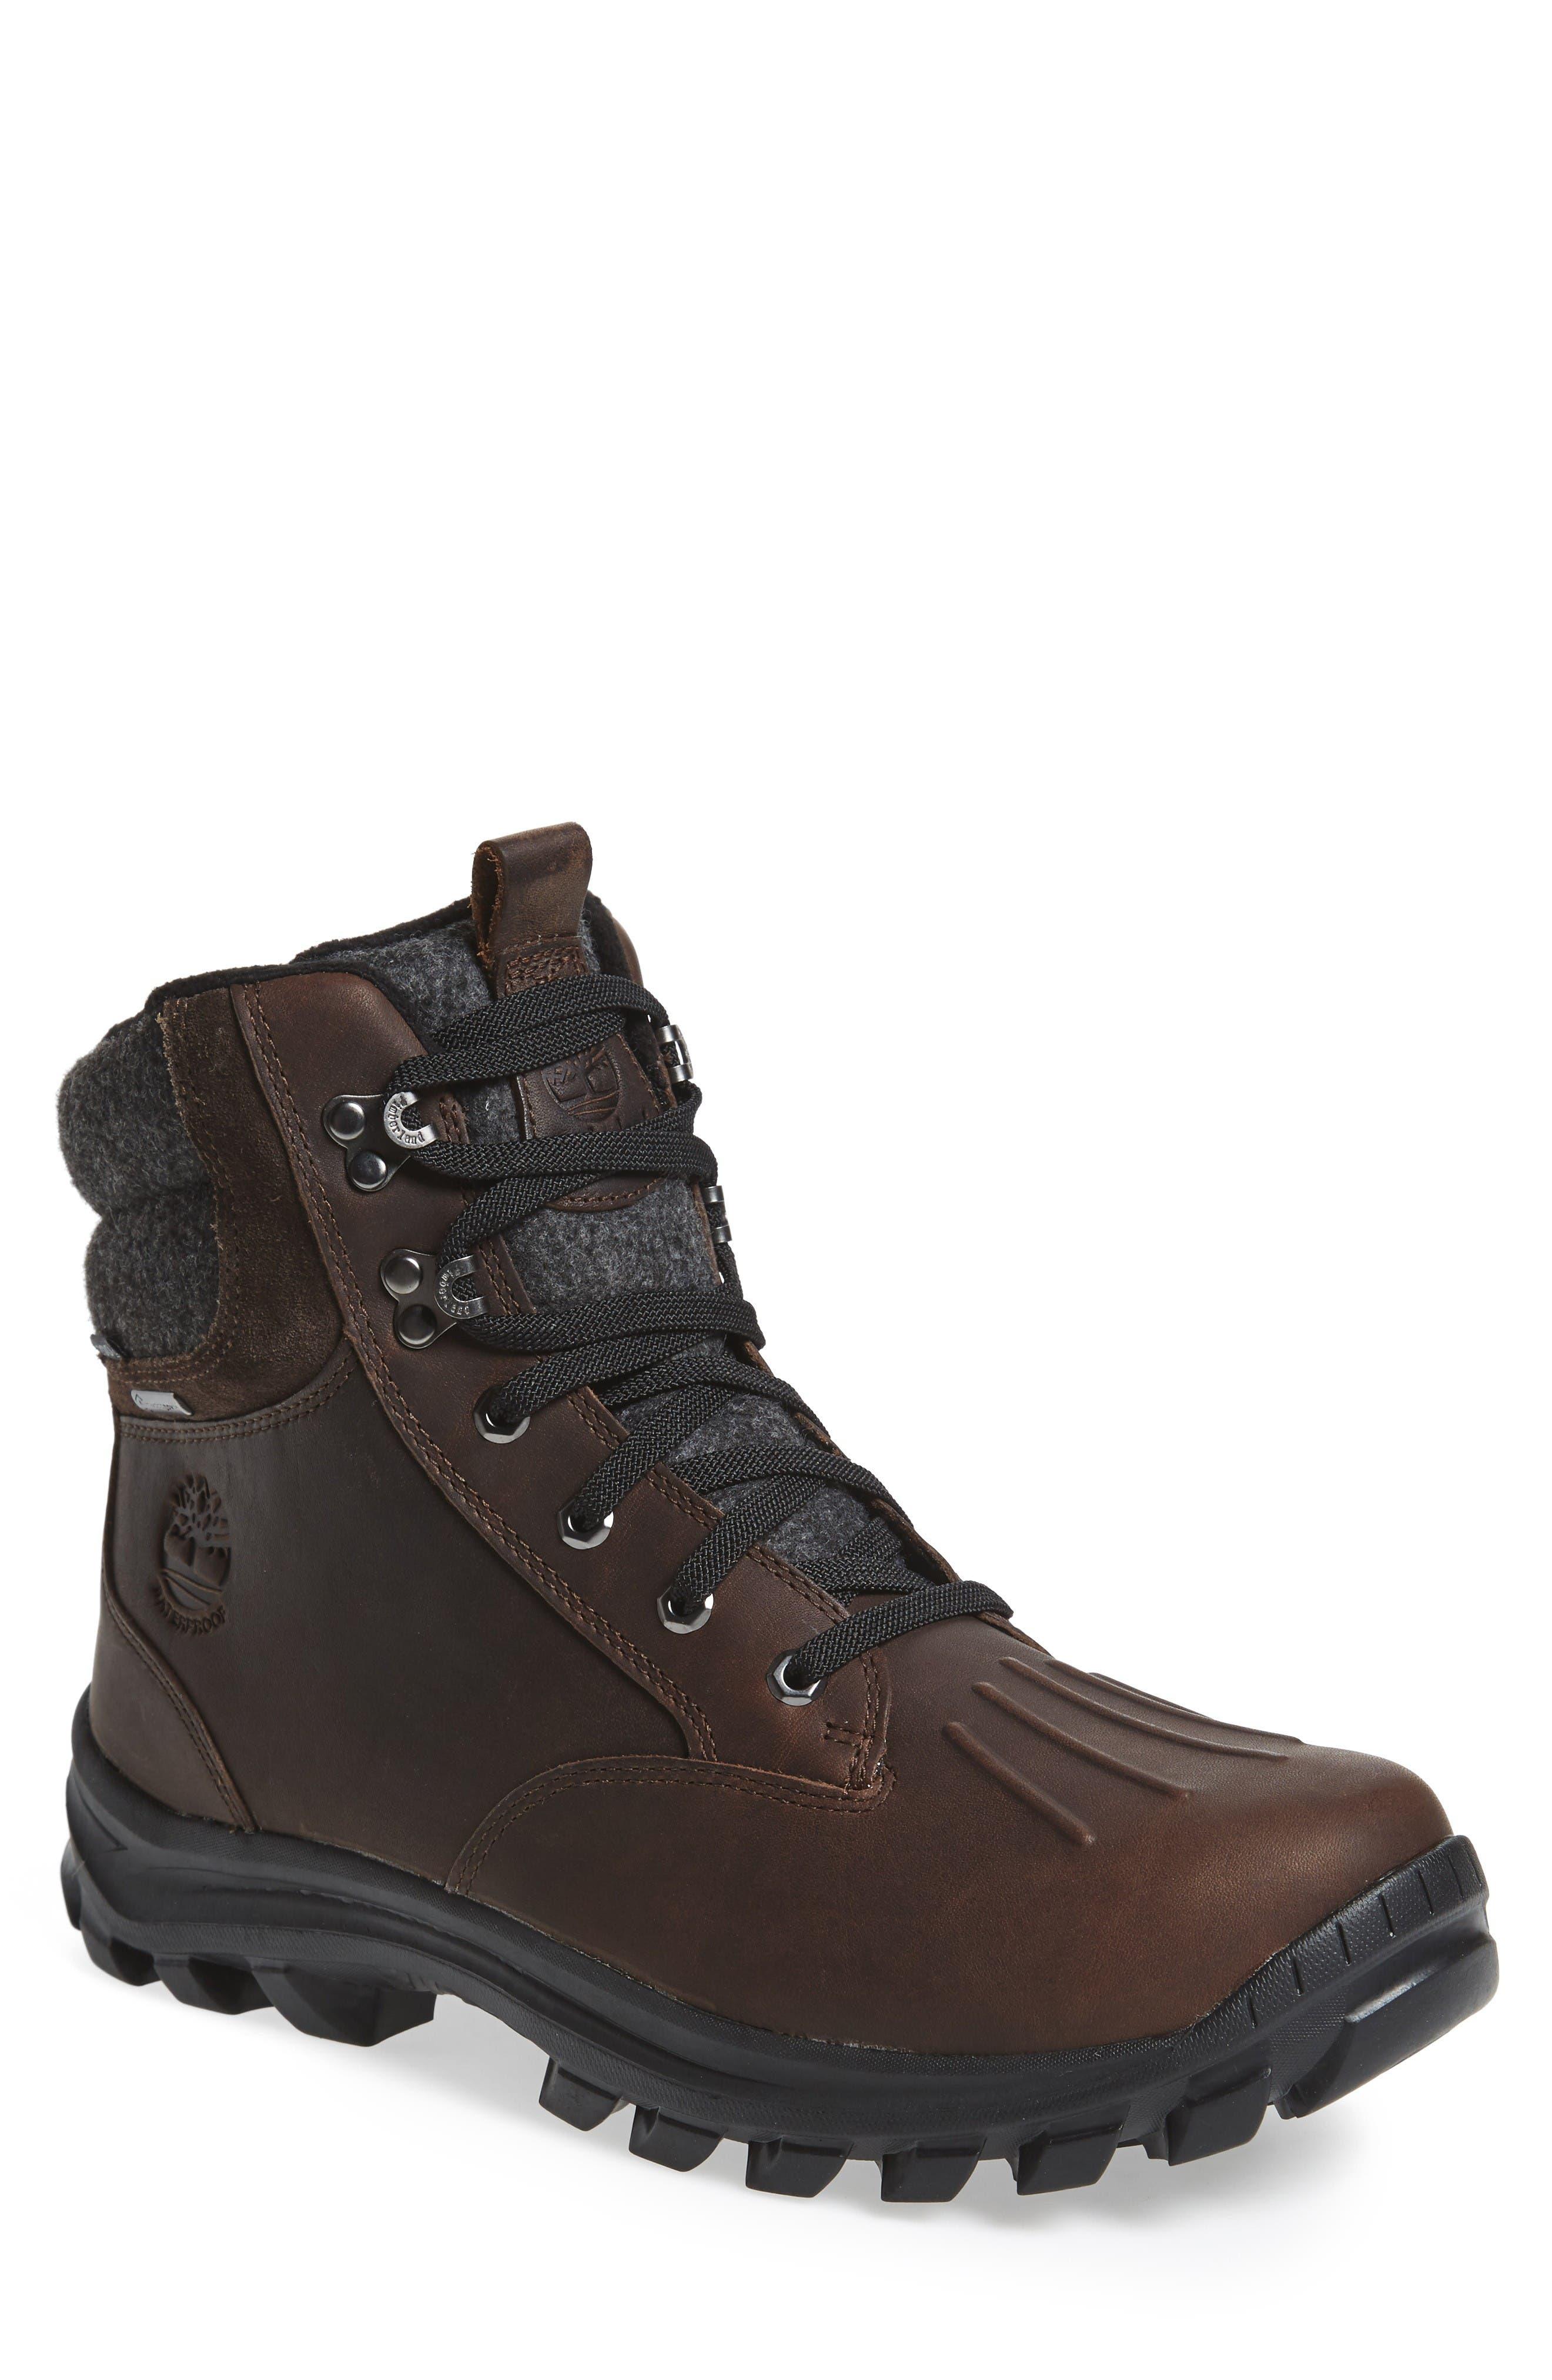 Alternate Image 1 Selected - Timberland Chillberg Mid Waterproof Snow Boot (Men)